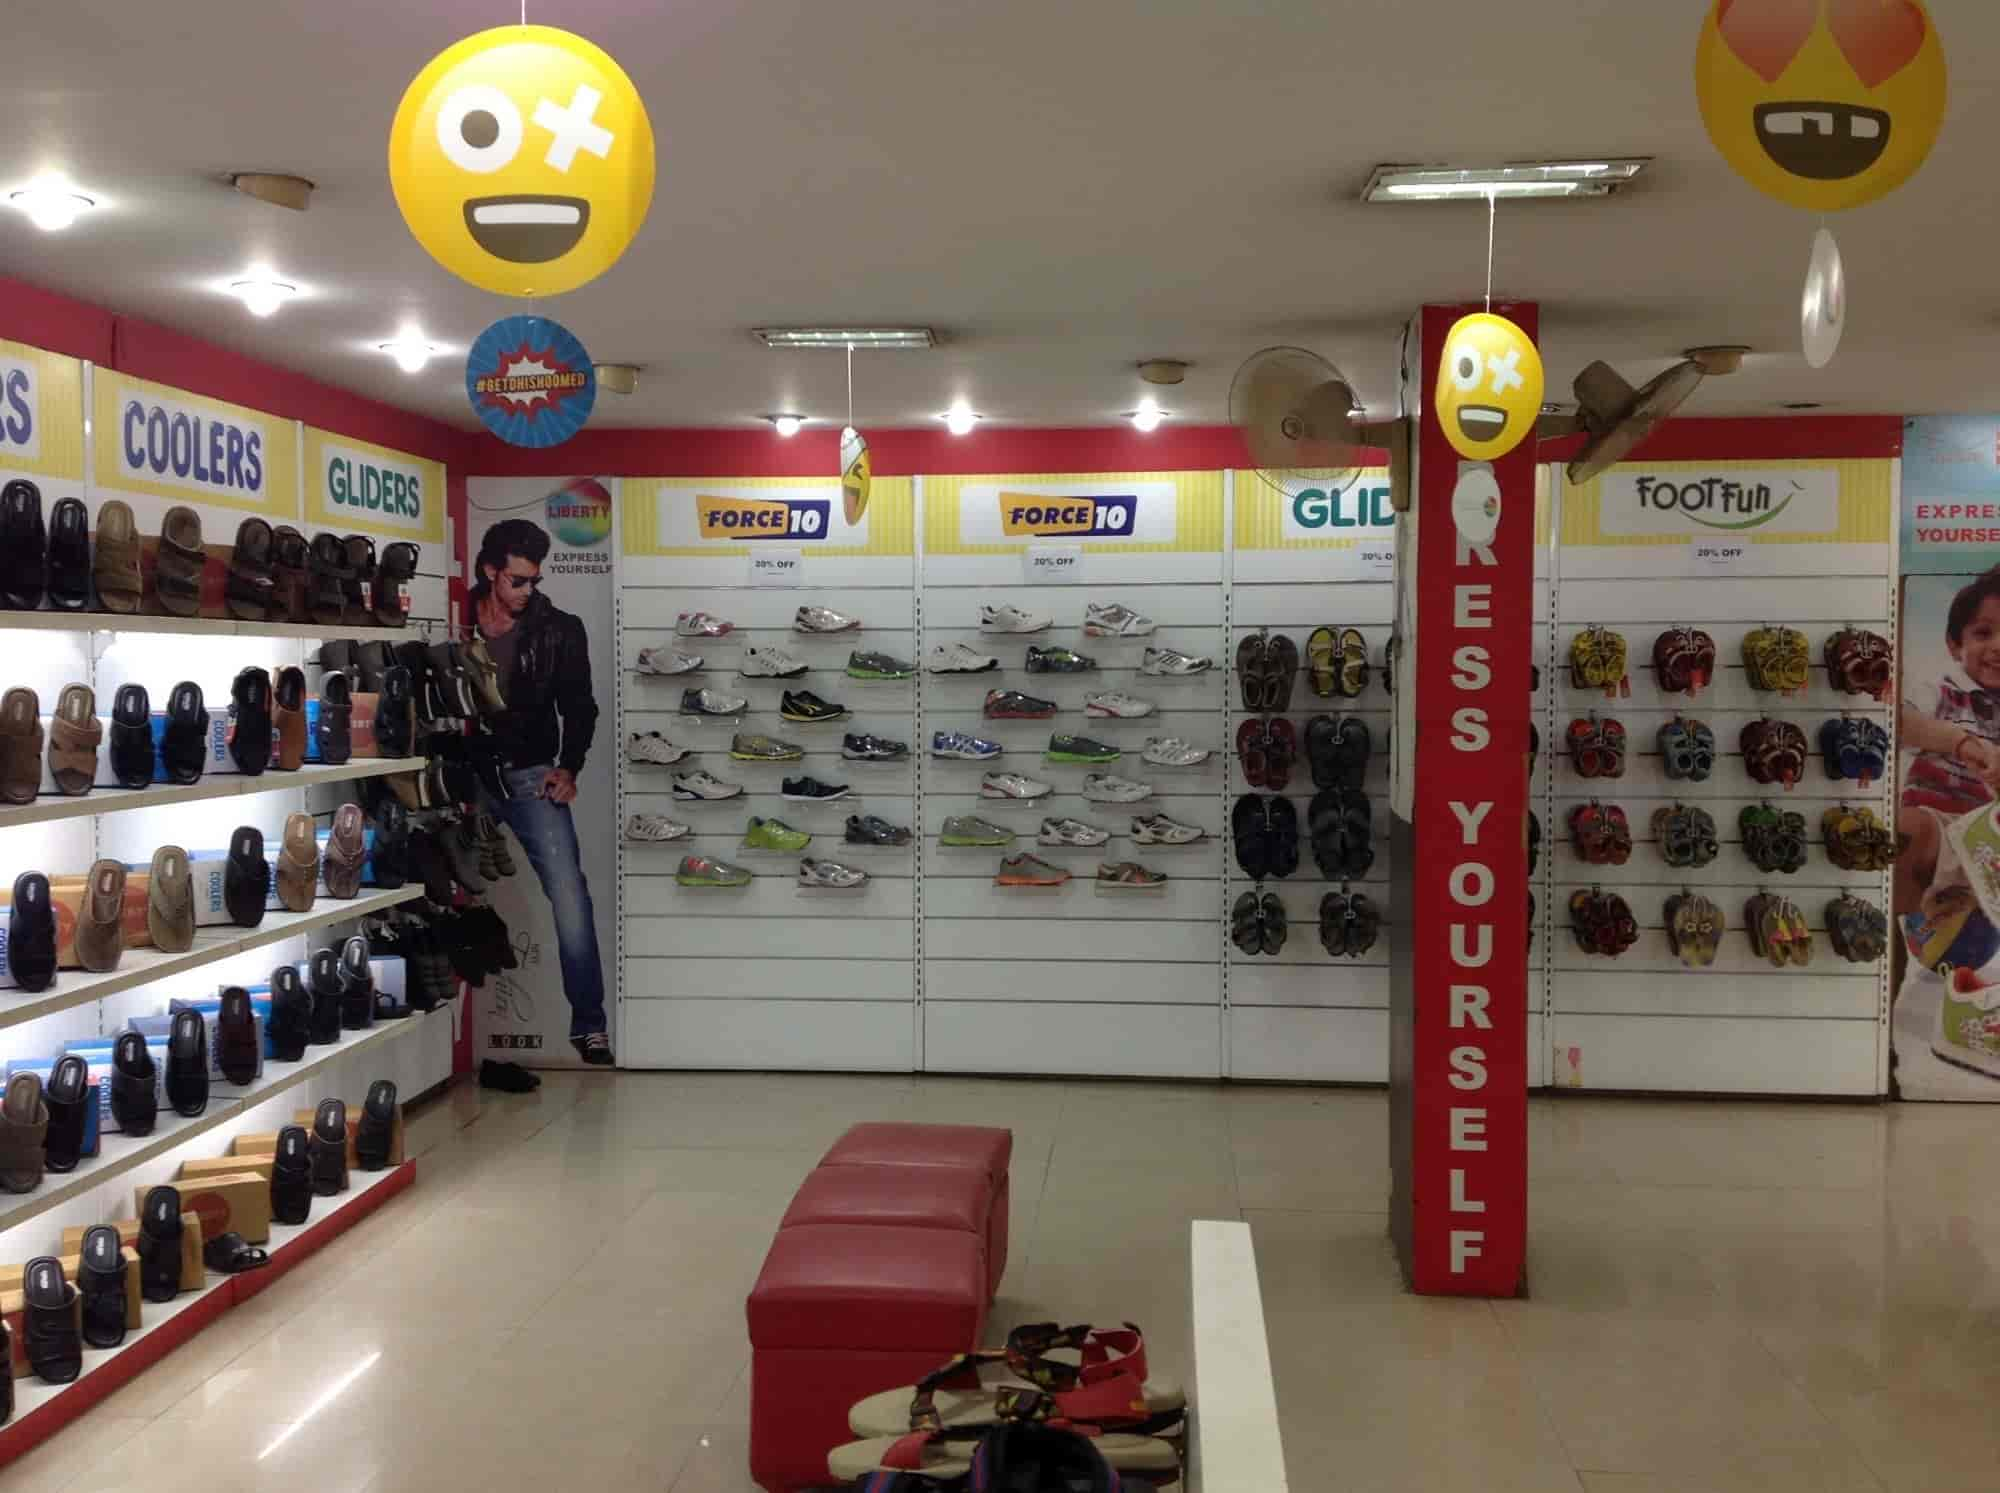 Liberty exclusive shomroom sunkadakatte shoe dealers liberty in liberty exclusive shomroom sunkadakatte shoe dealers liberty in bangalore justdial solutioingenieria Choice Image